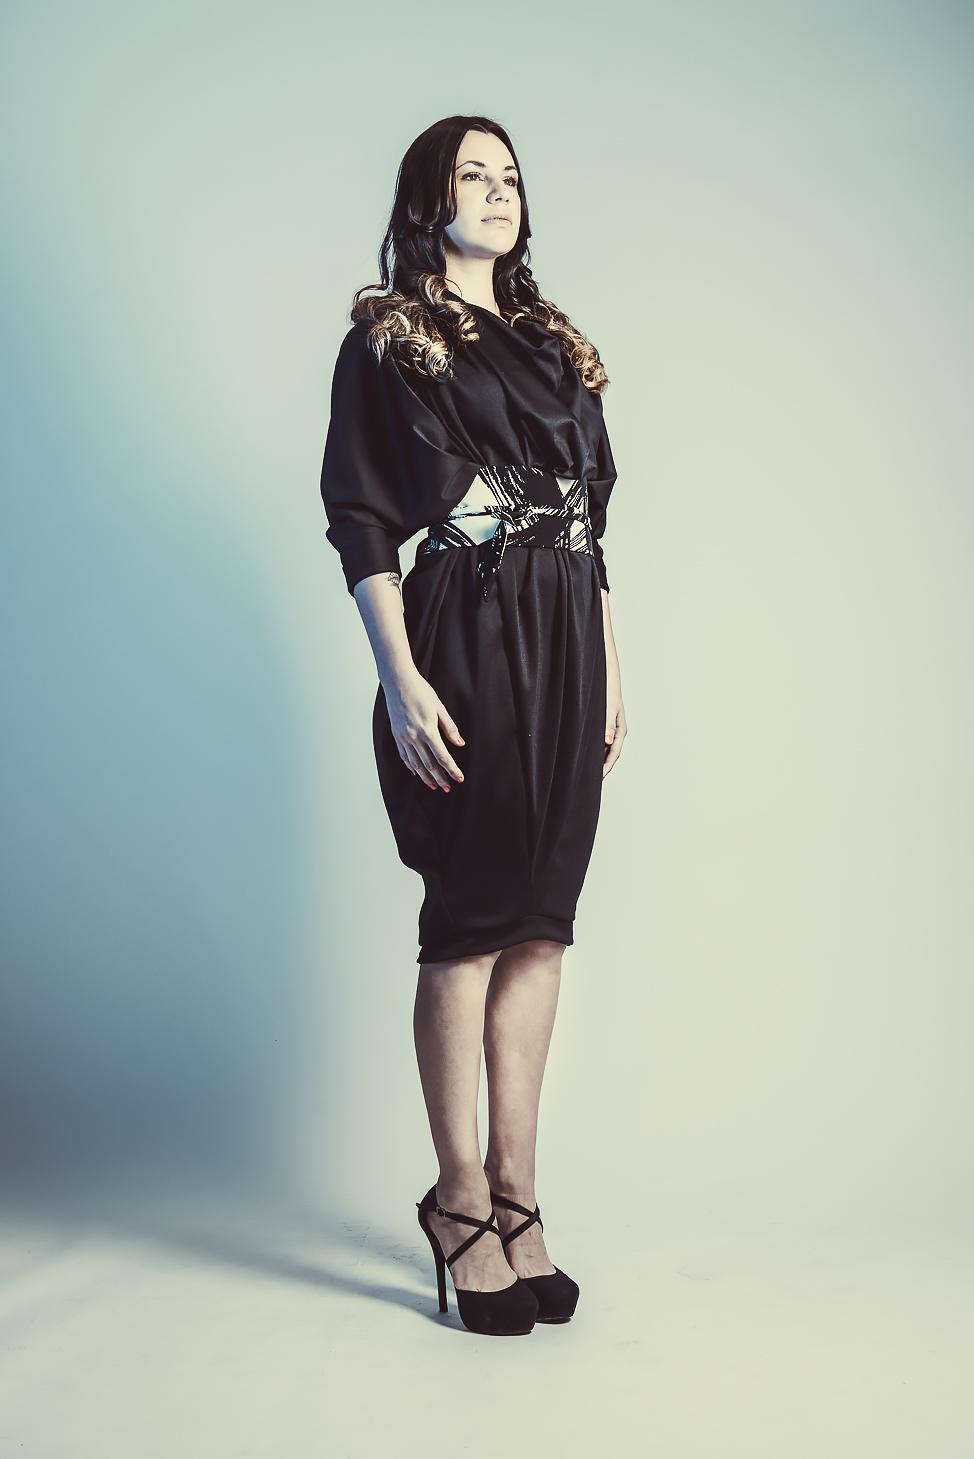 zaramia-ava-zaramiaava-leeds-fashion-designer-ethical-sustainable-tailored-minimalist-aya-print-dress-obi-belt-black-versatile-drape-cowl-styling-womenswear-models-photoshoot-shrine-hairdressers-18